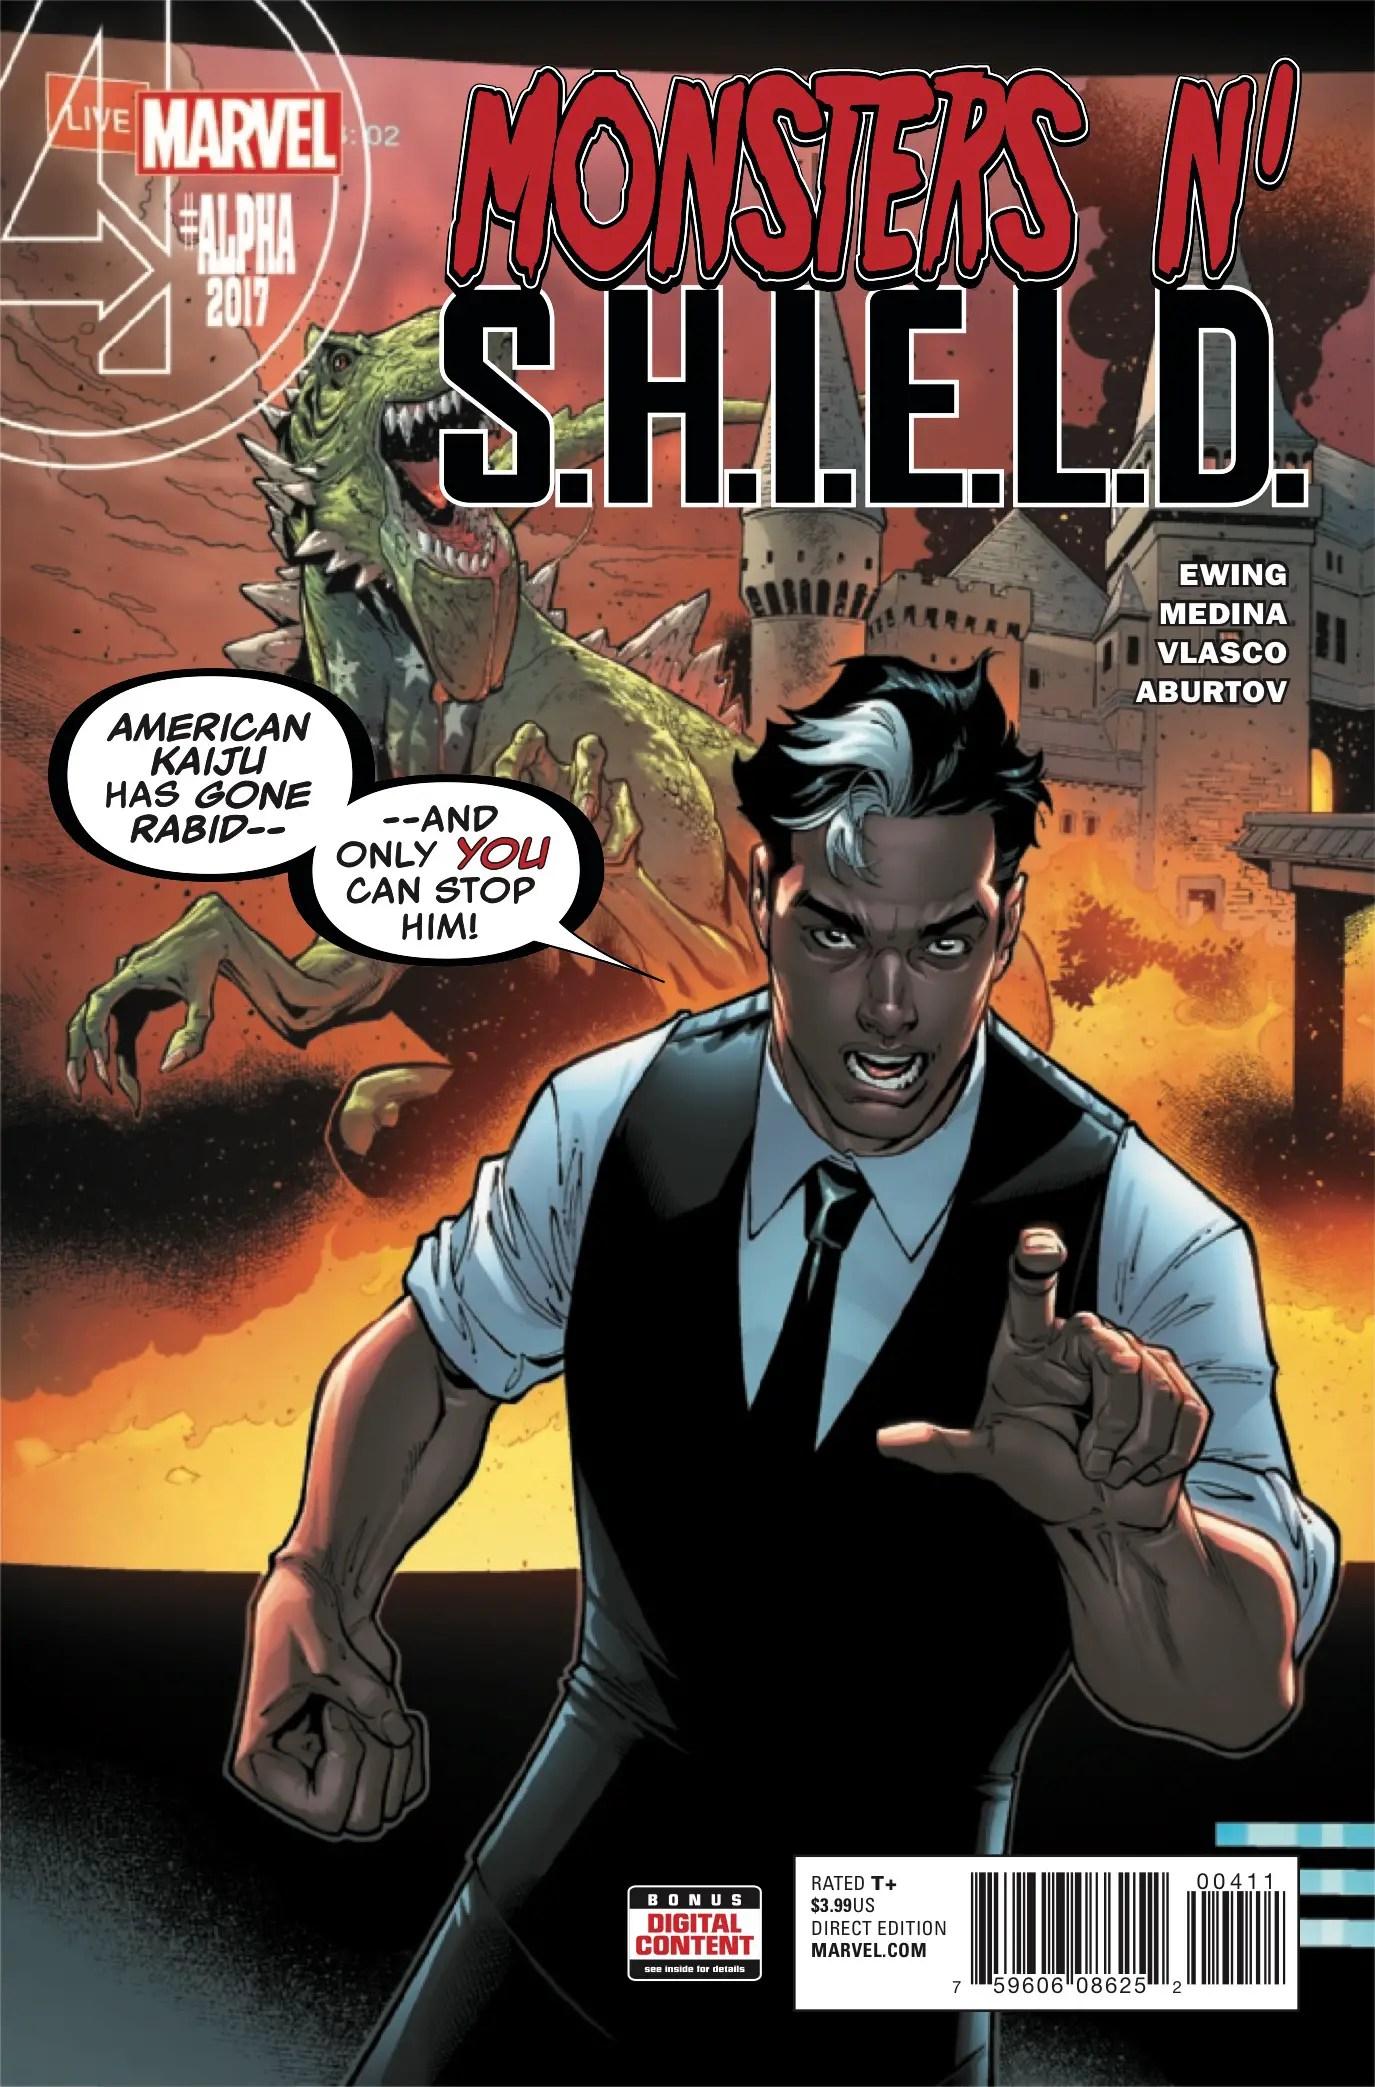 U.S. Avengers #4 Review